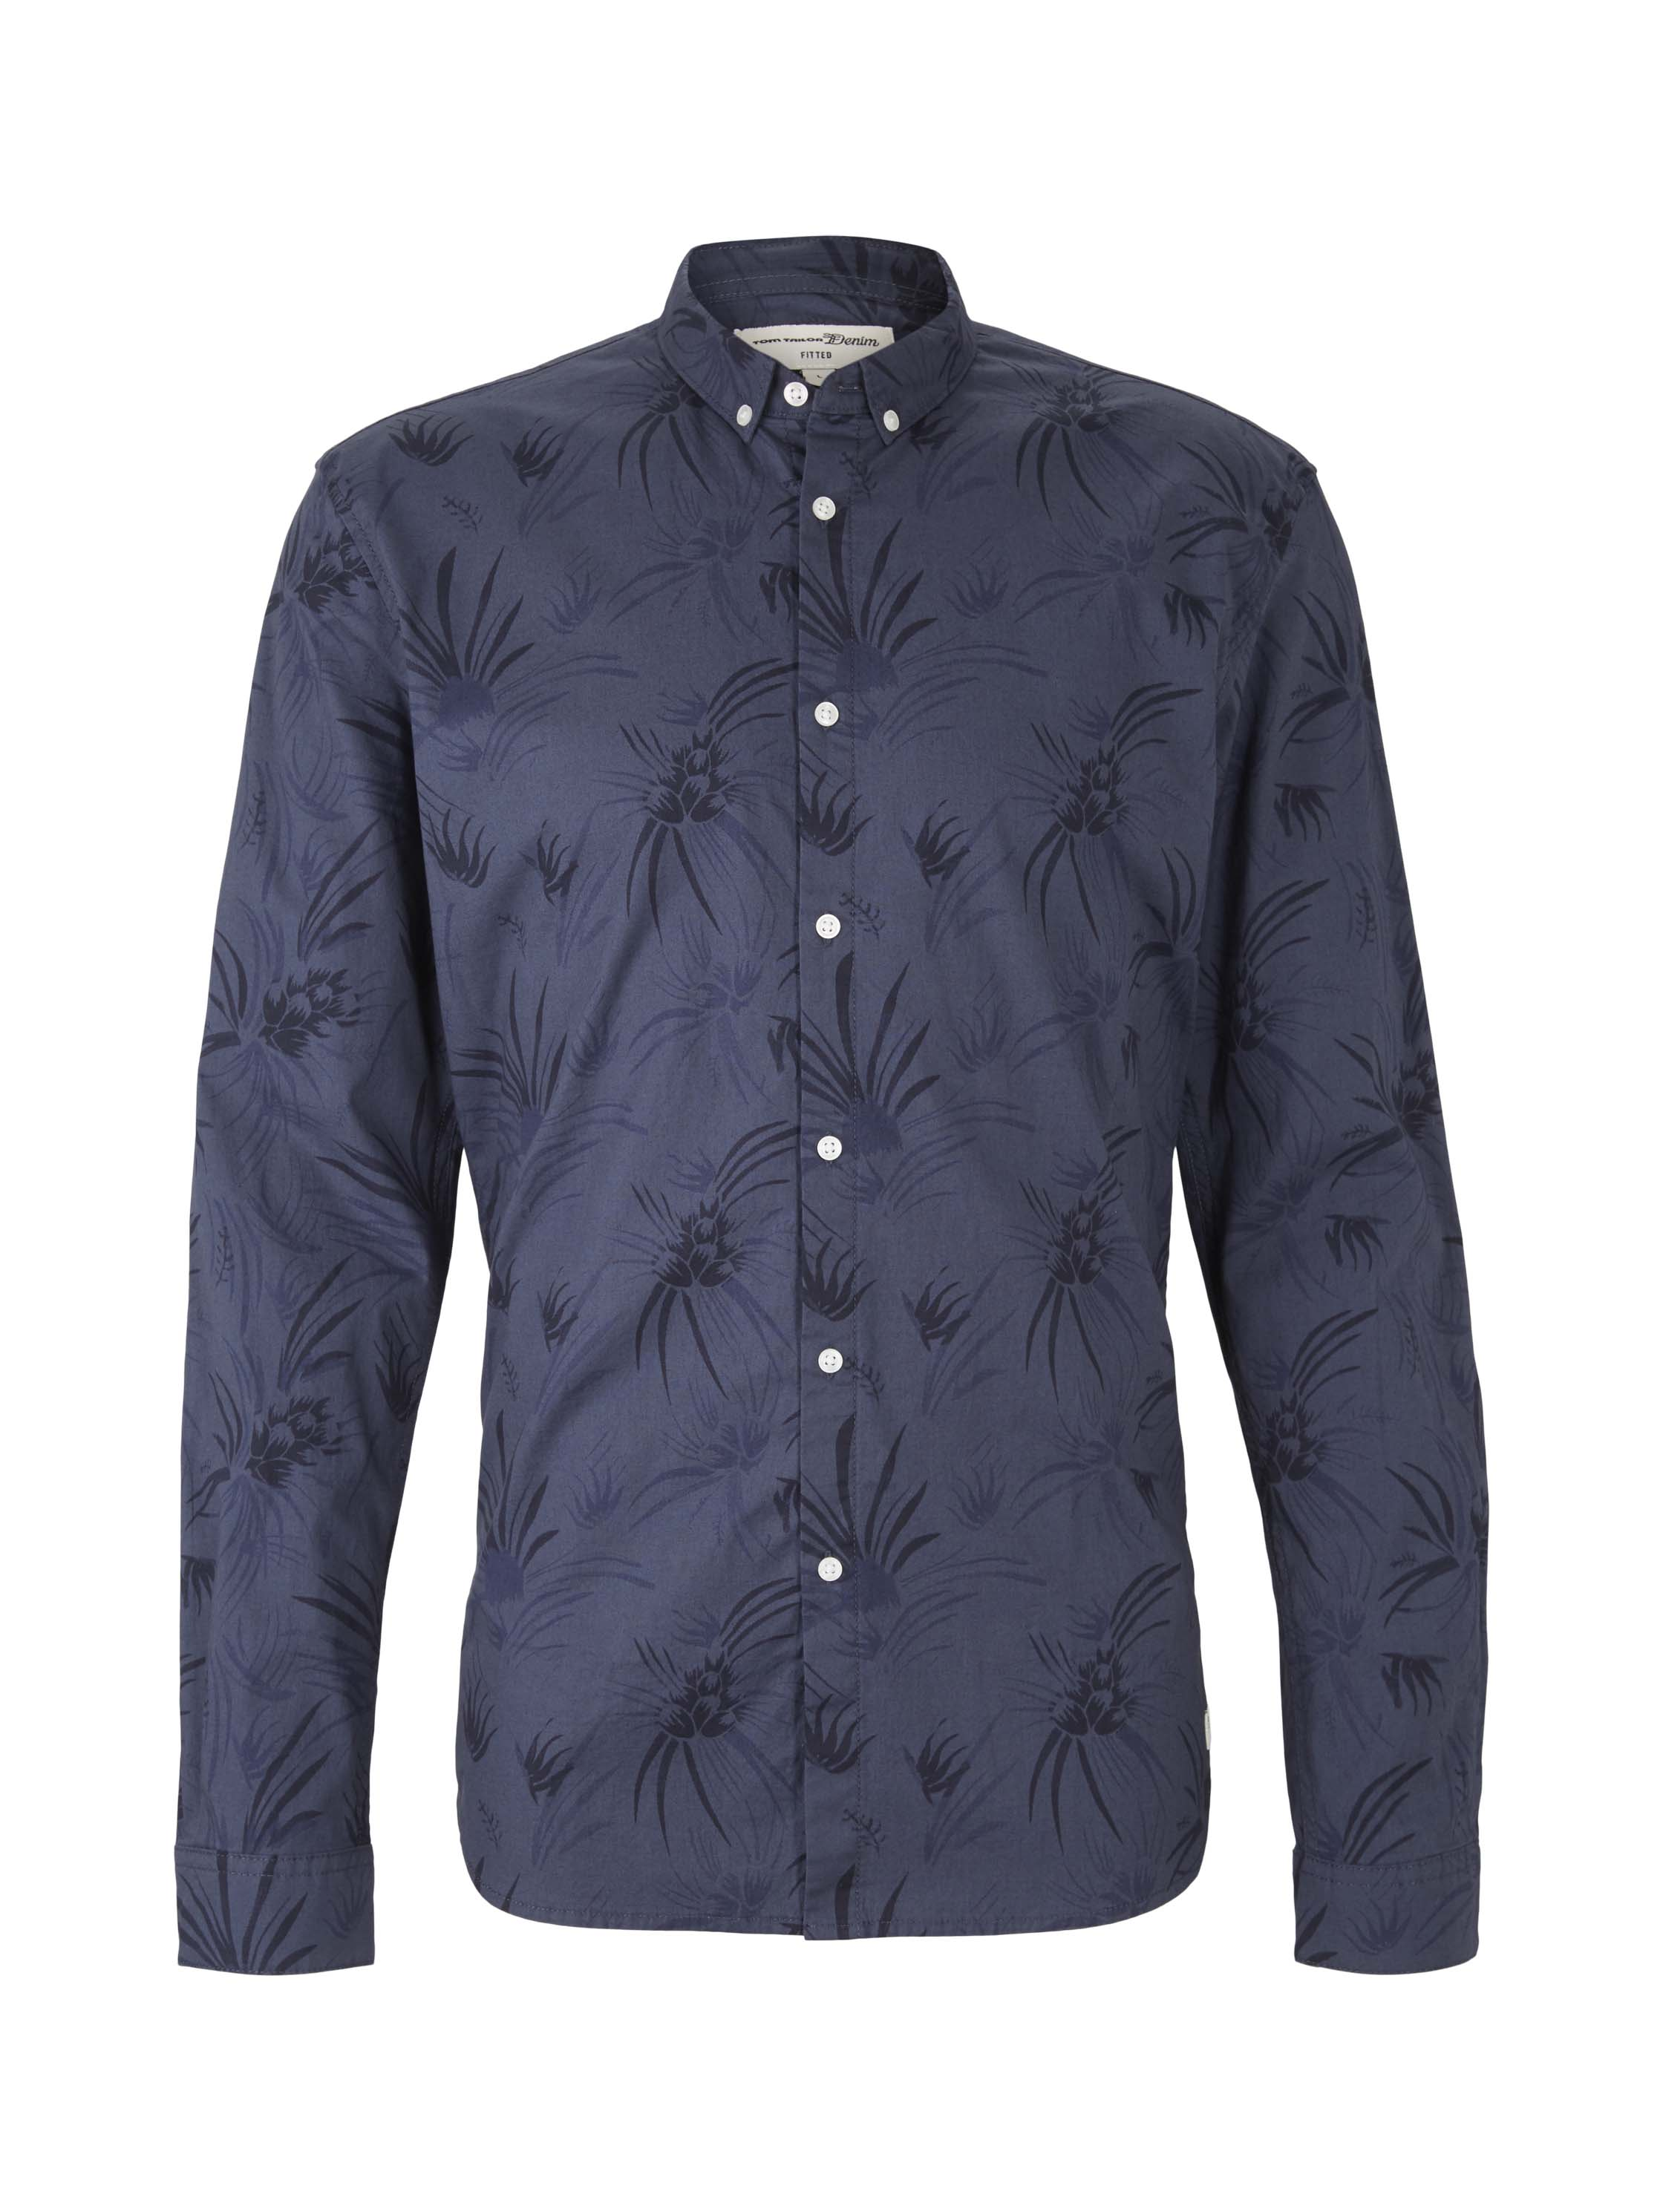 AOP shirt, navy blue thistle print